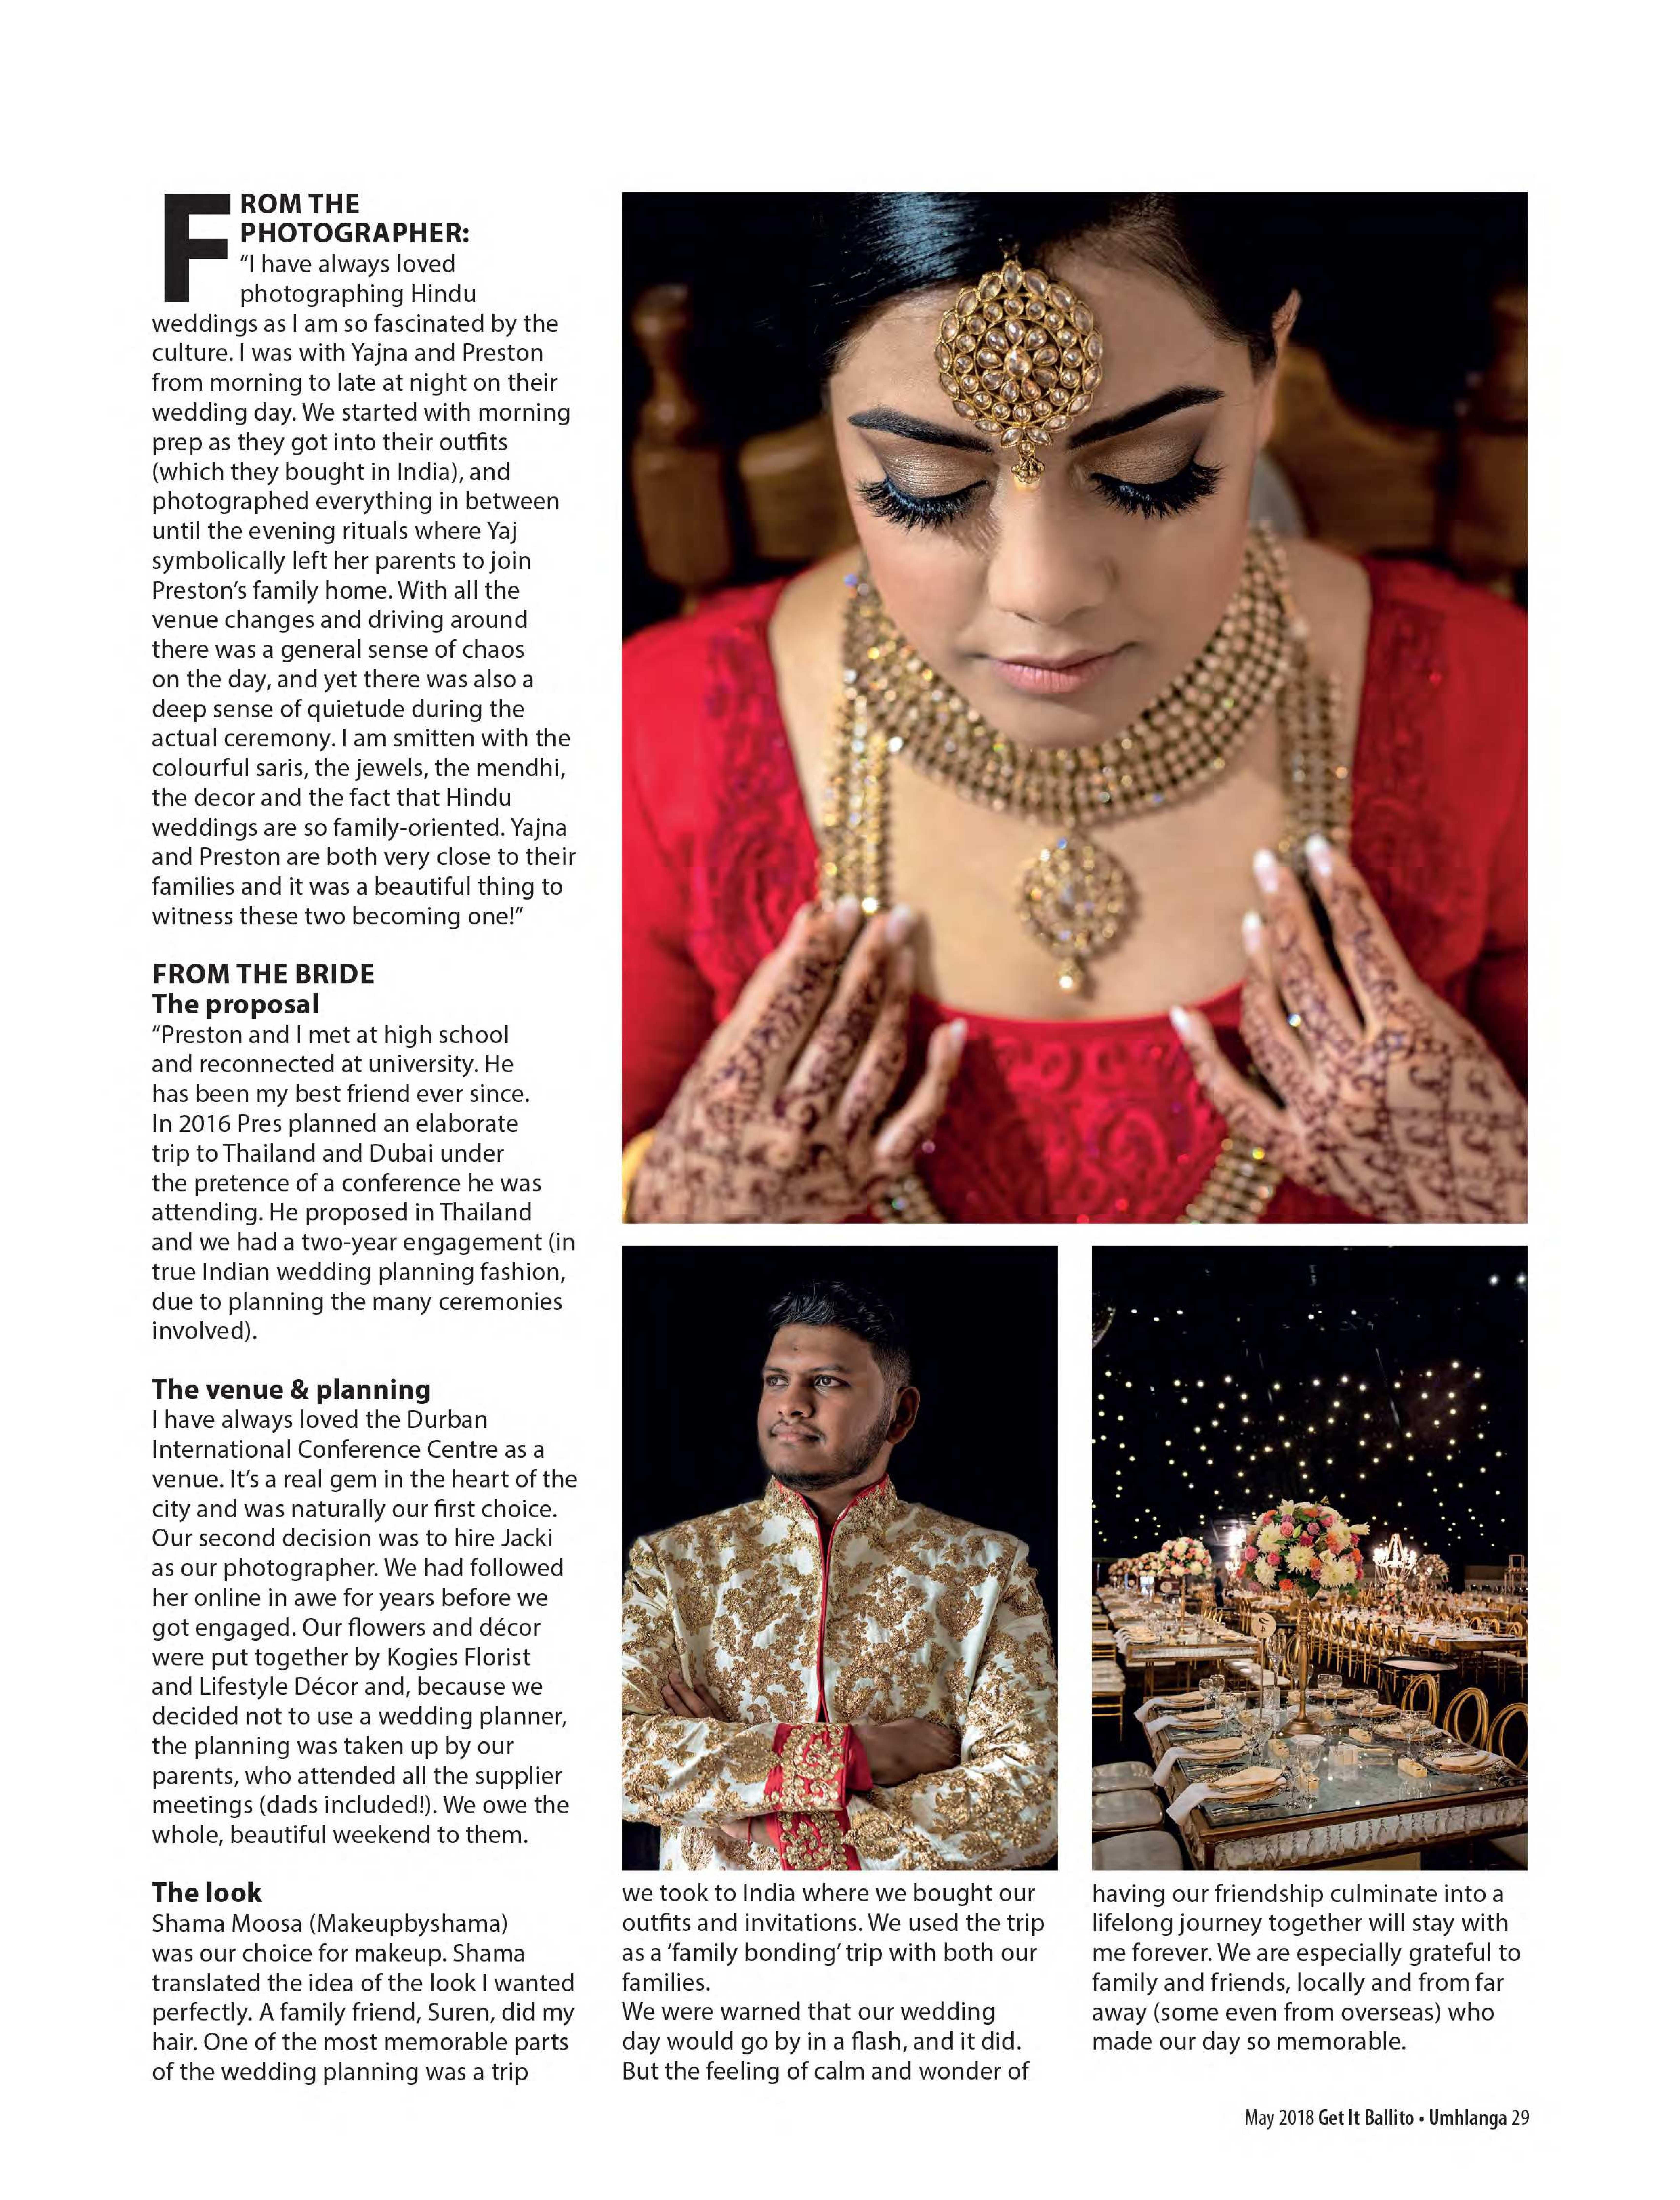 get-magazine-ballitoumhlanga-may-2018-epapers-page-31